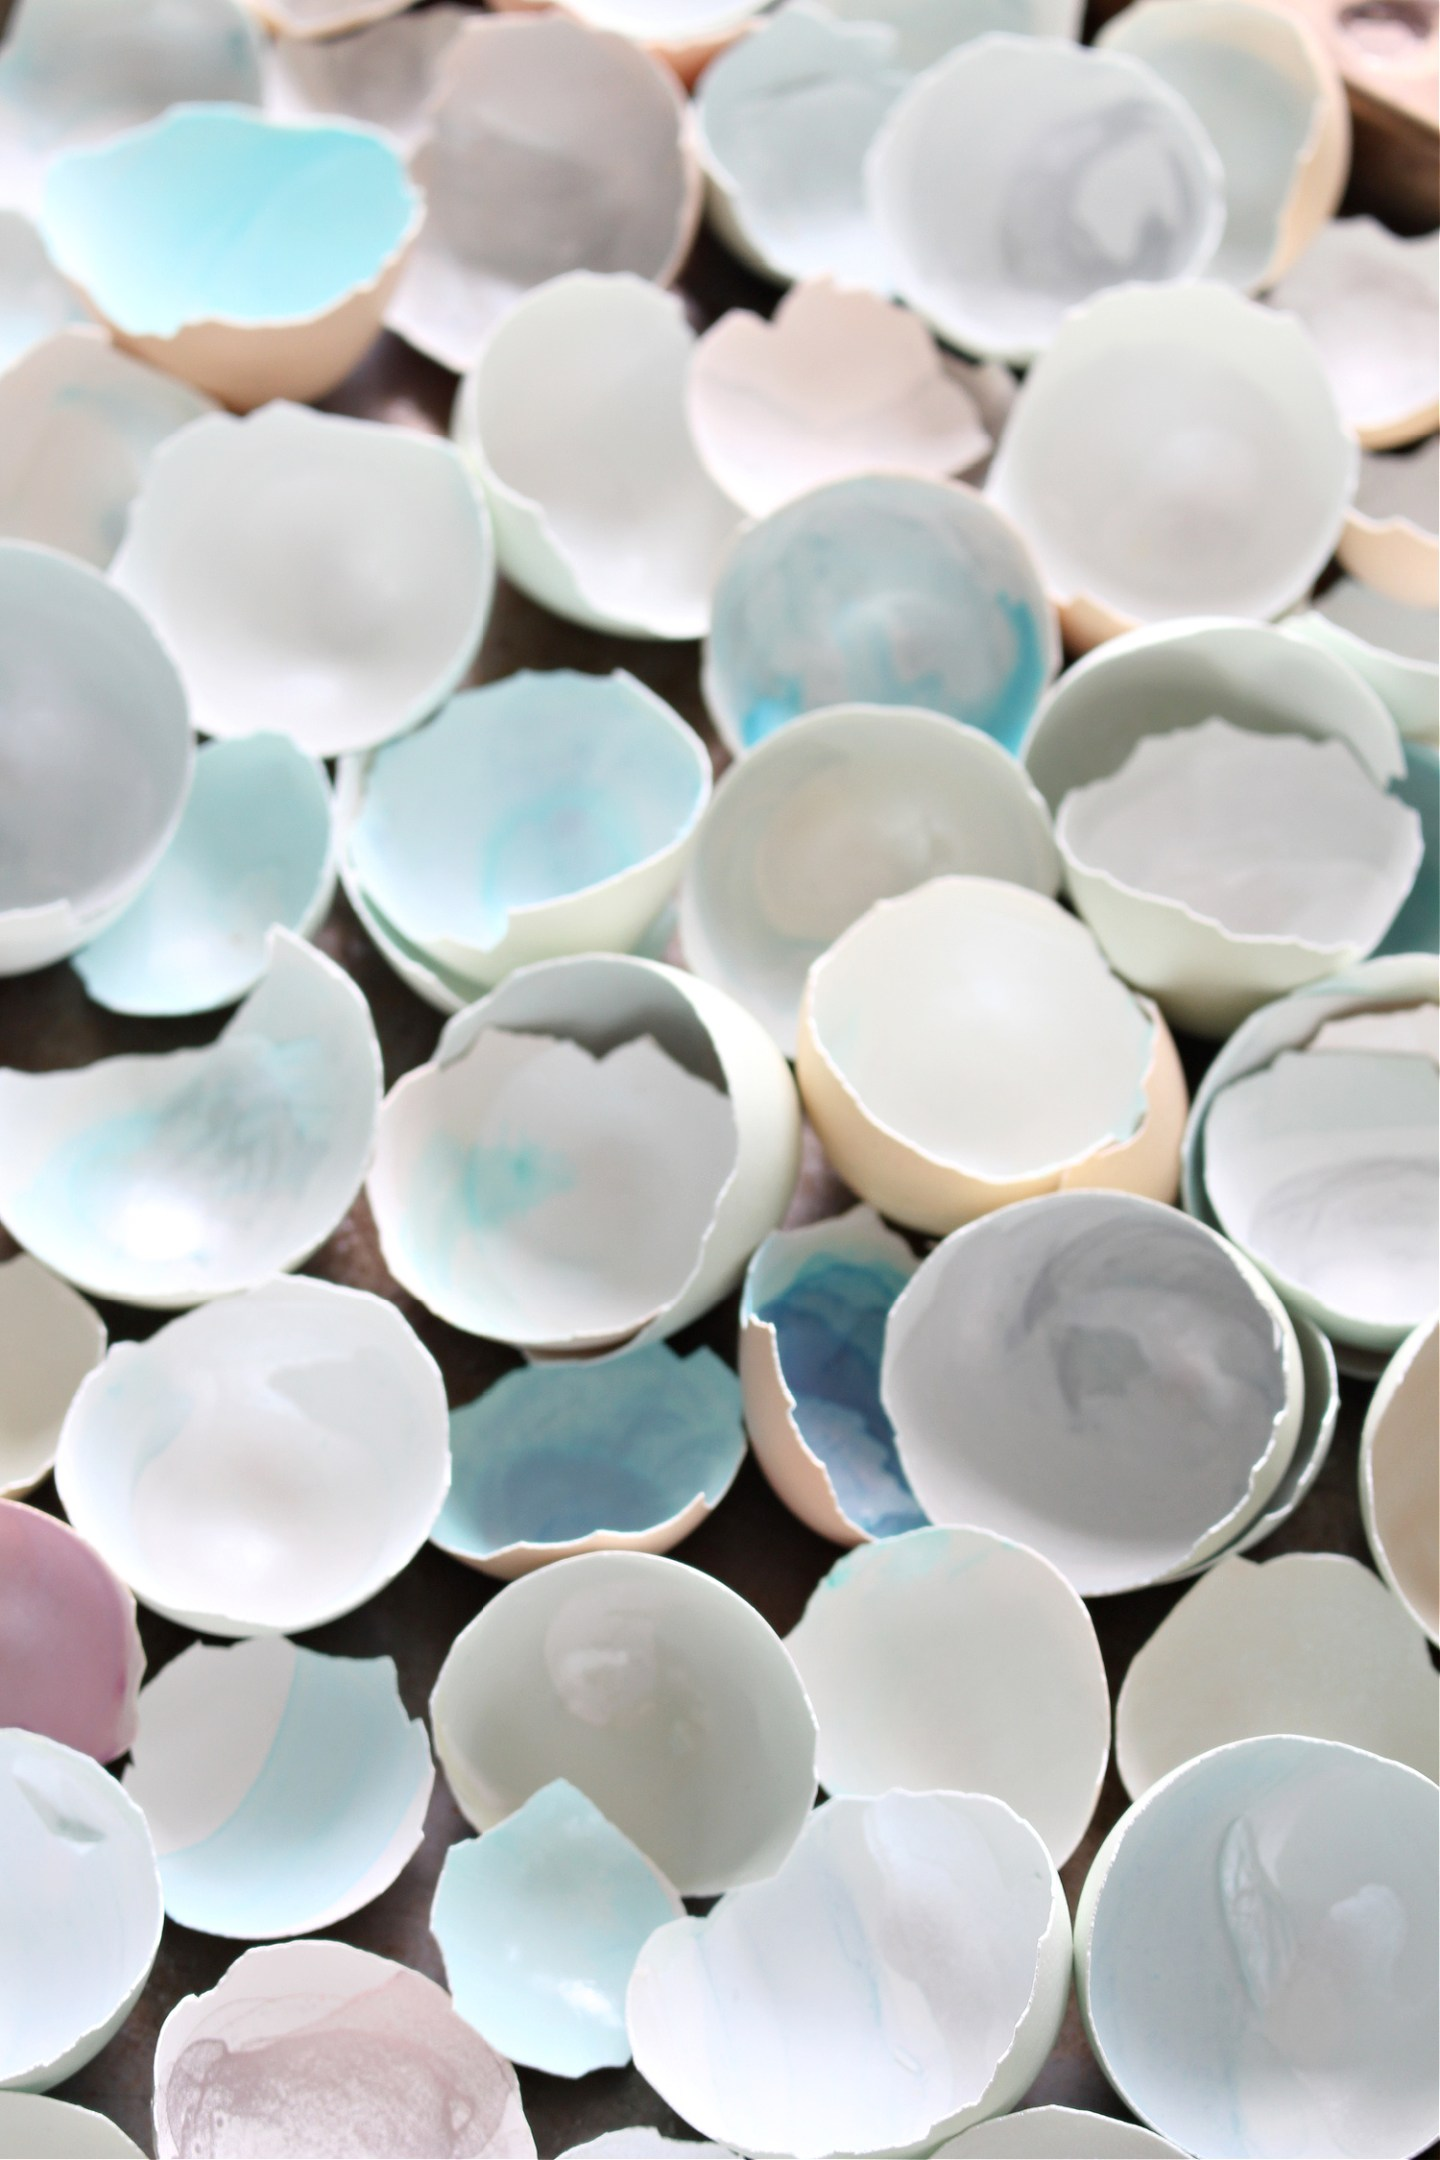 Craft idea for egg shells